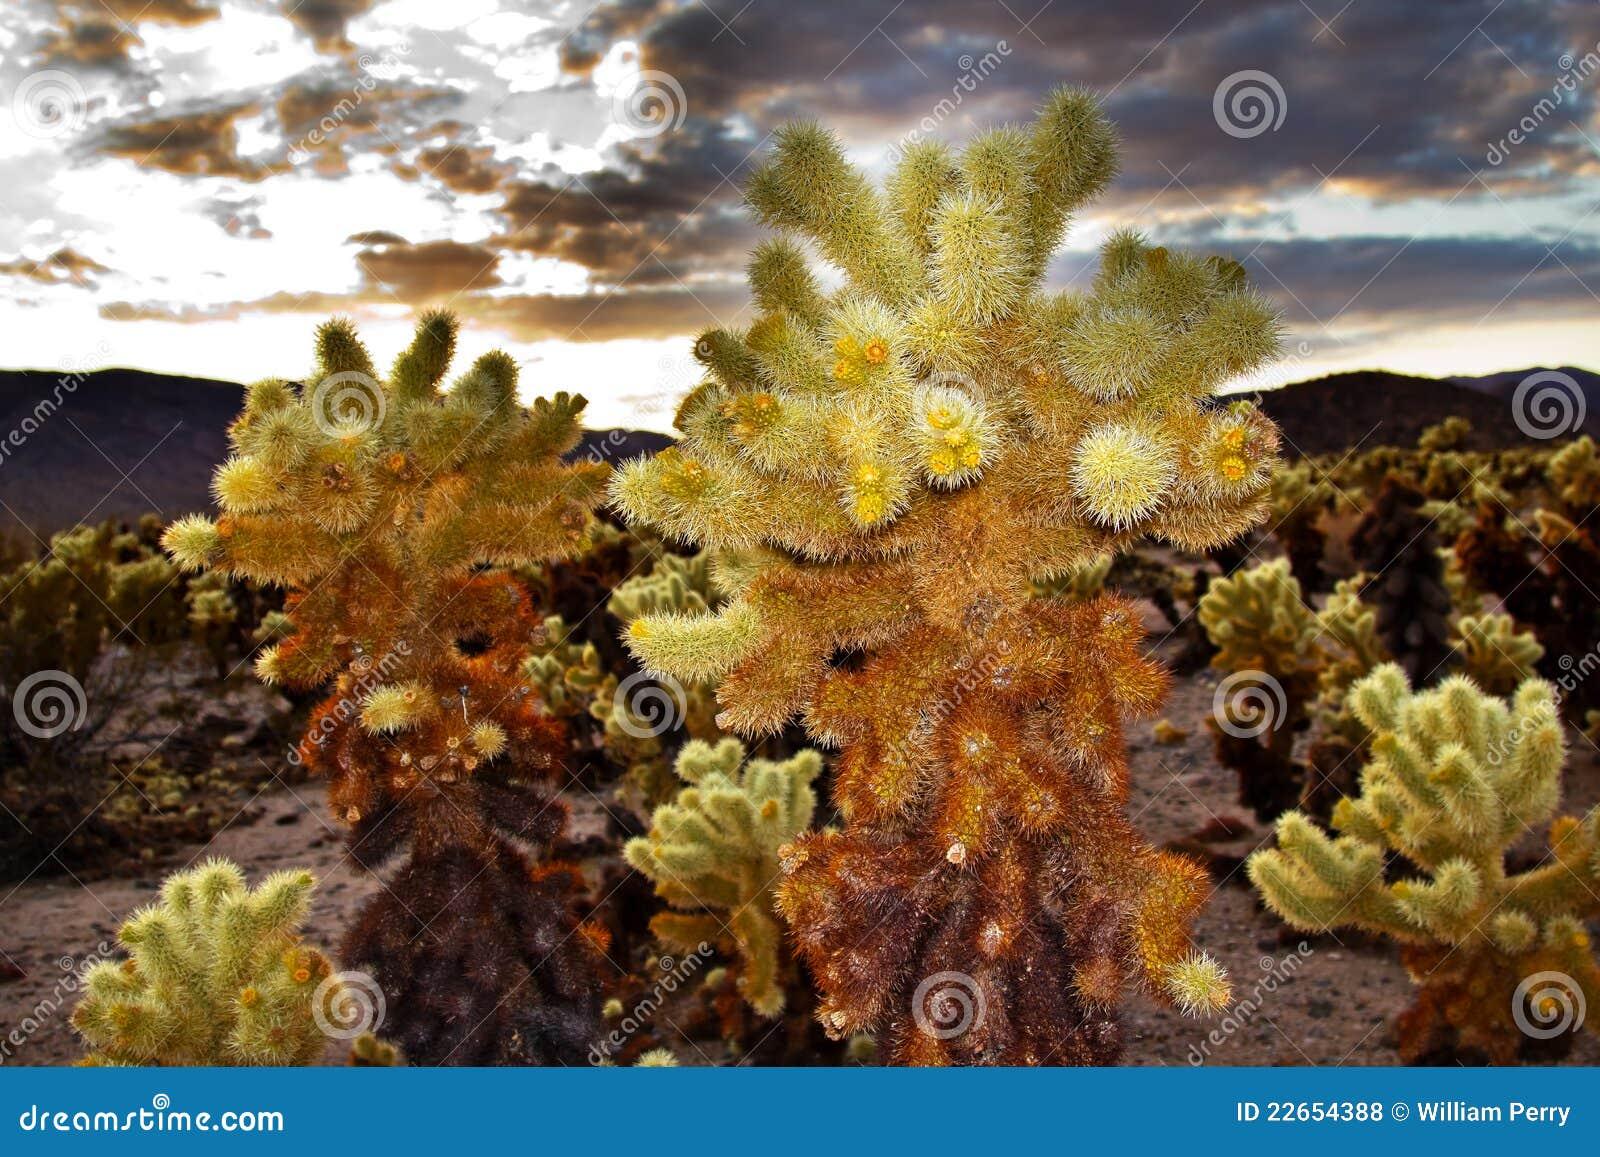 Cholla Cactus Garden Joshua Tree National Park Royalty Free Stock Photos Image 22654388